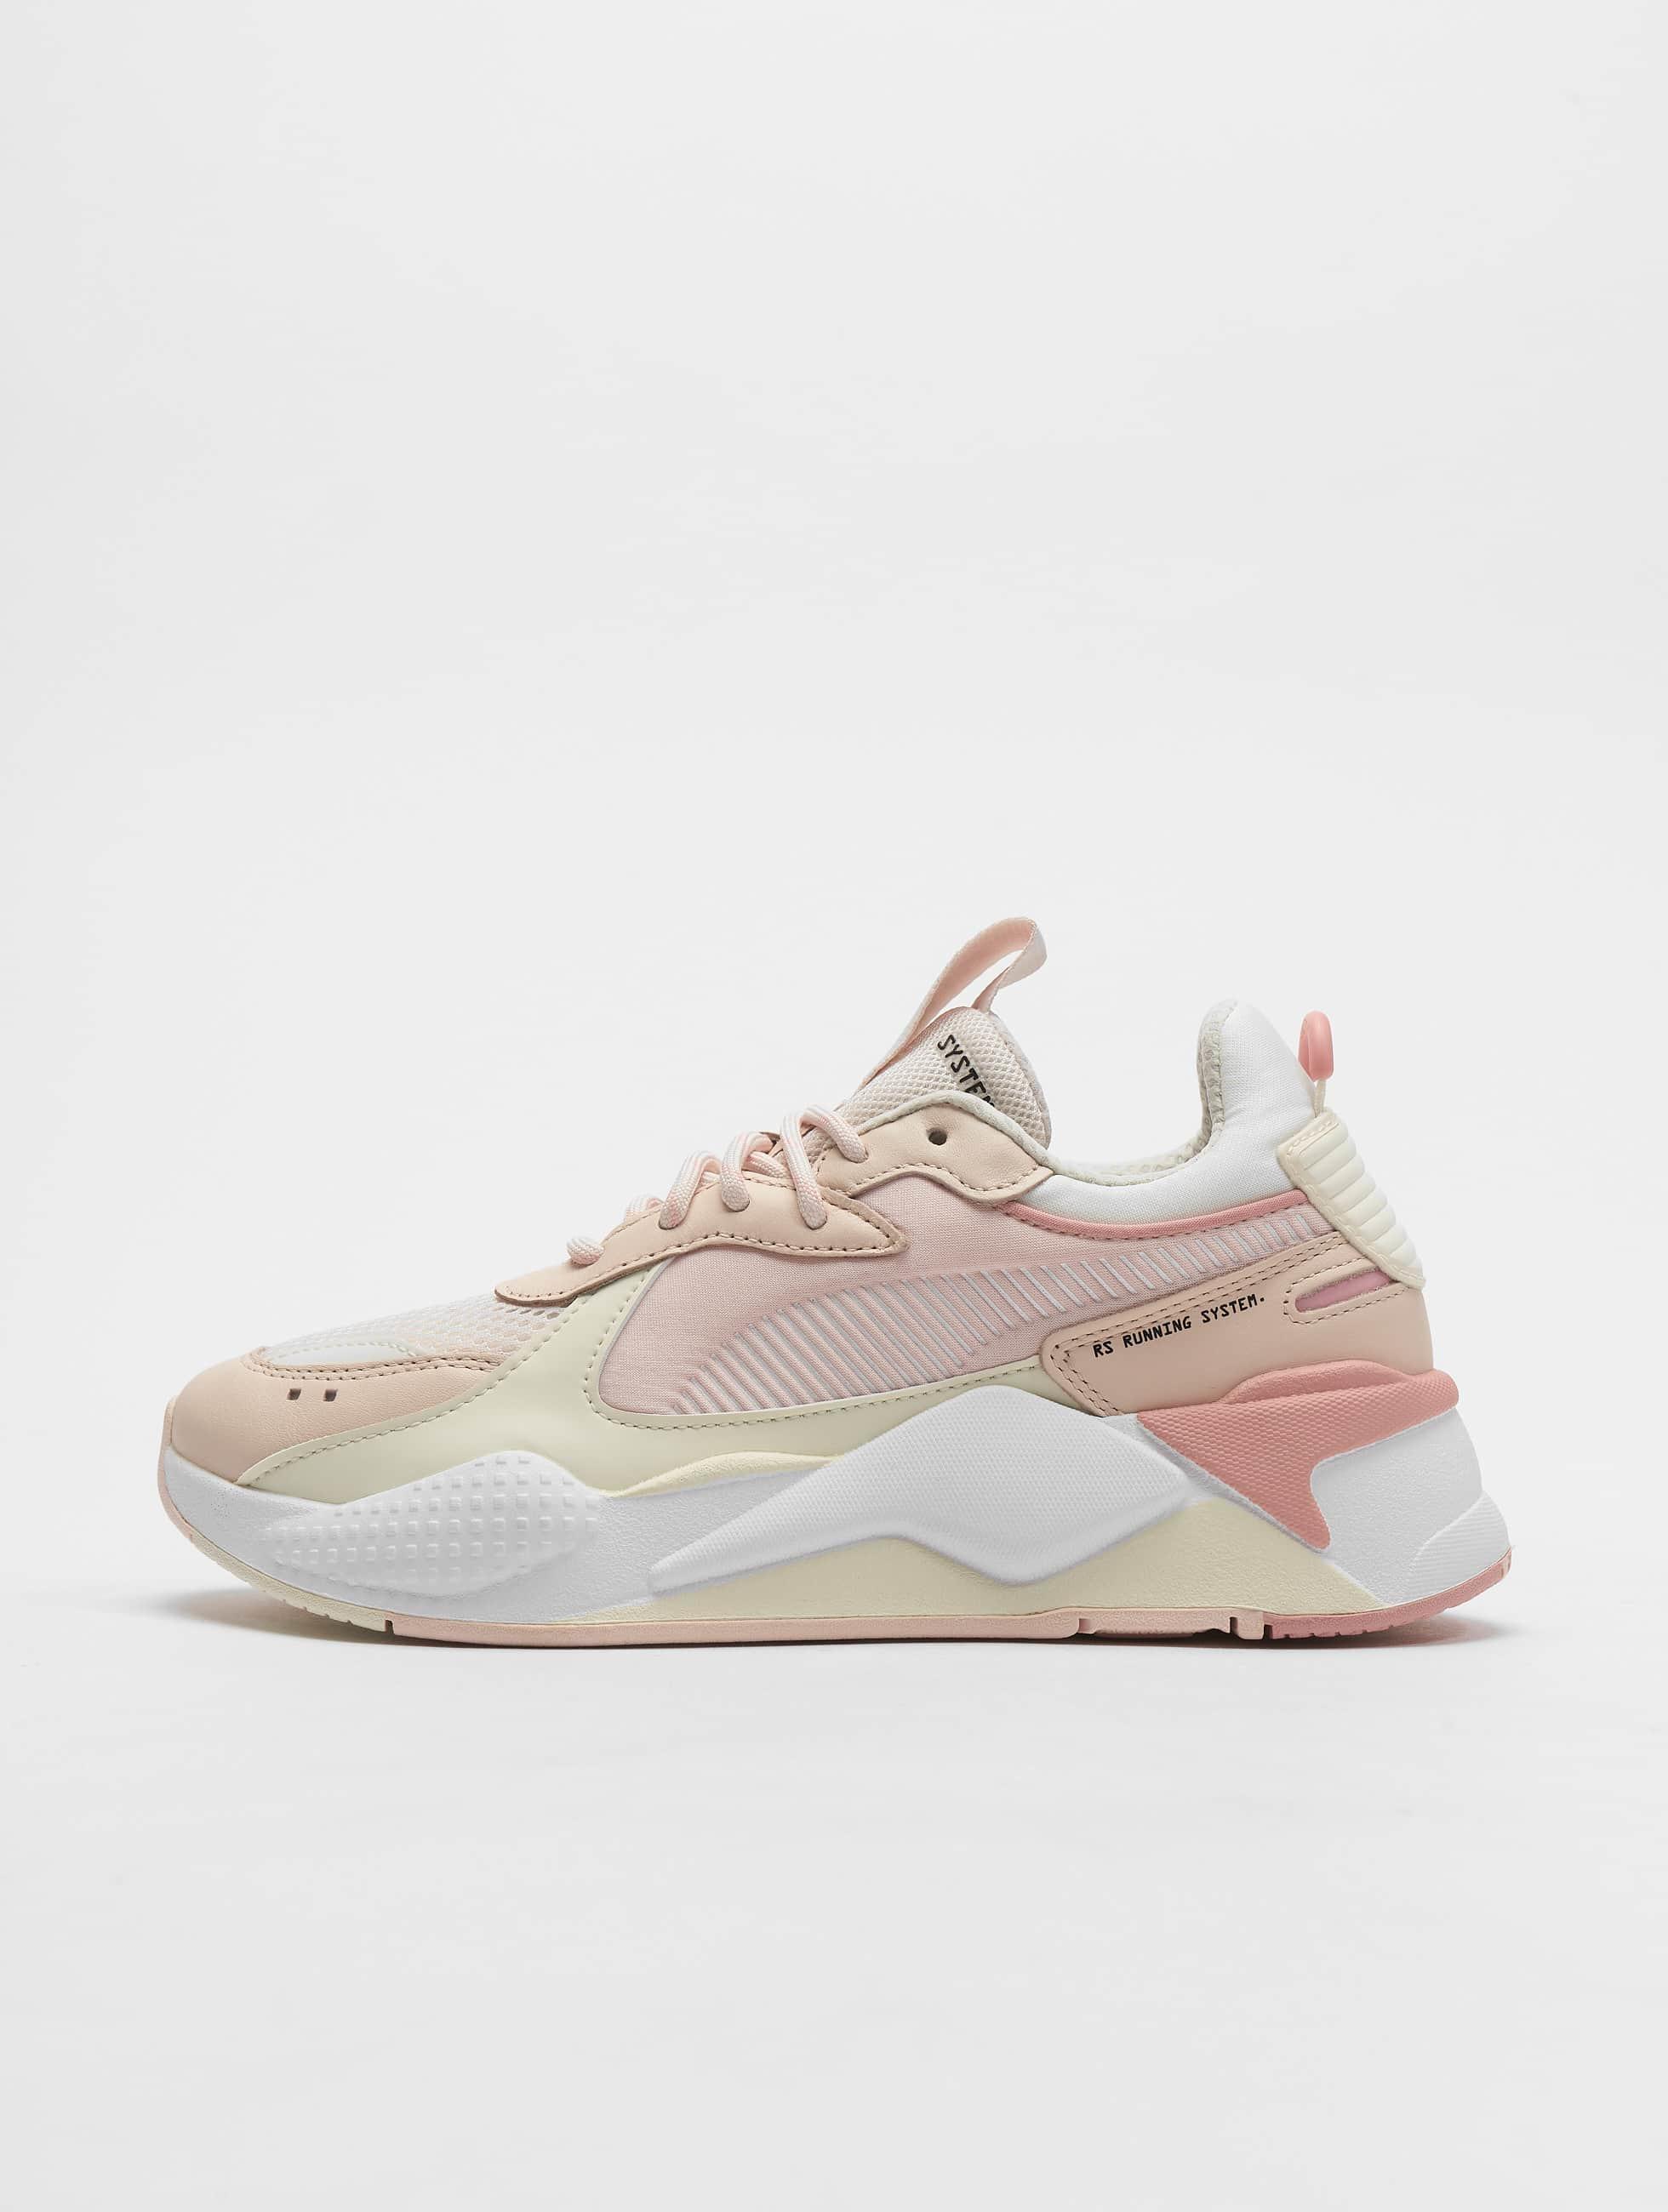 ed531dbdf63 Puma schoen / sneaker Rs-X Tracks in rose 652771